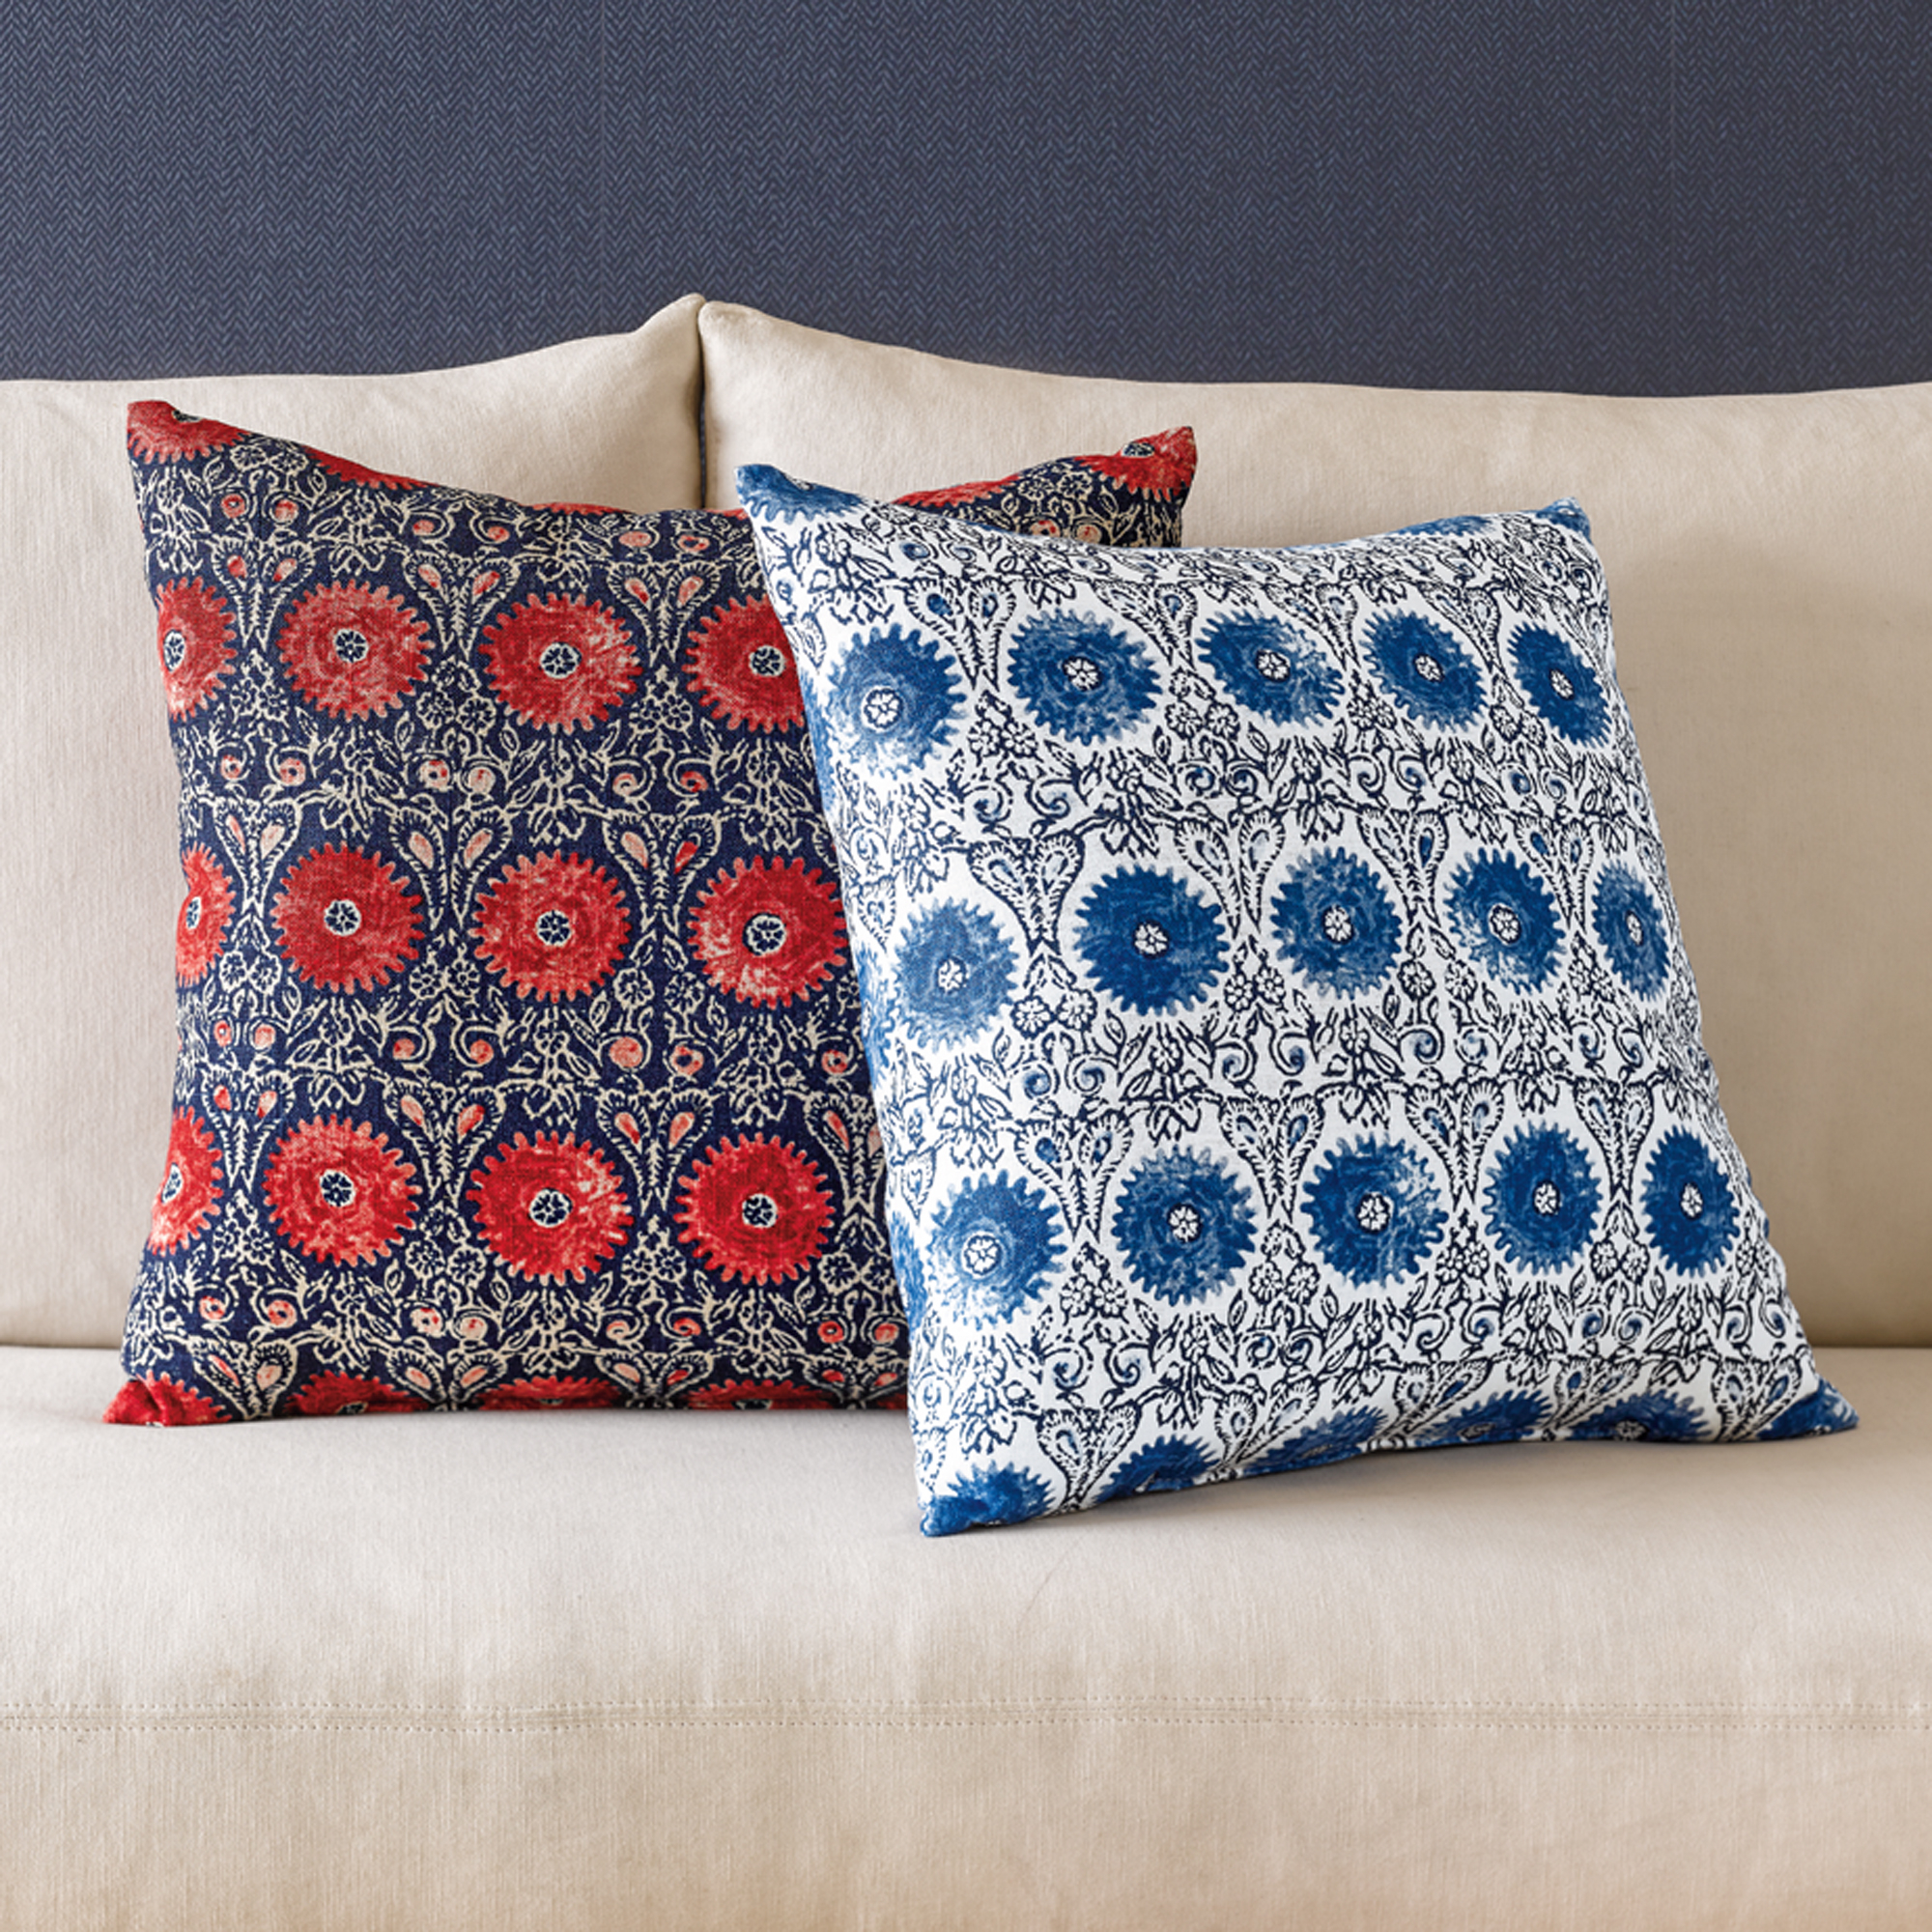 Throw Pillows Home : Sintra Pillows Gump s